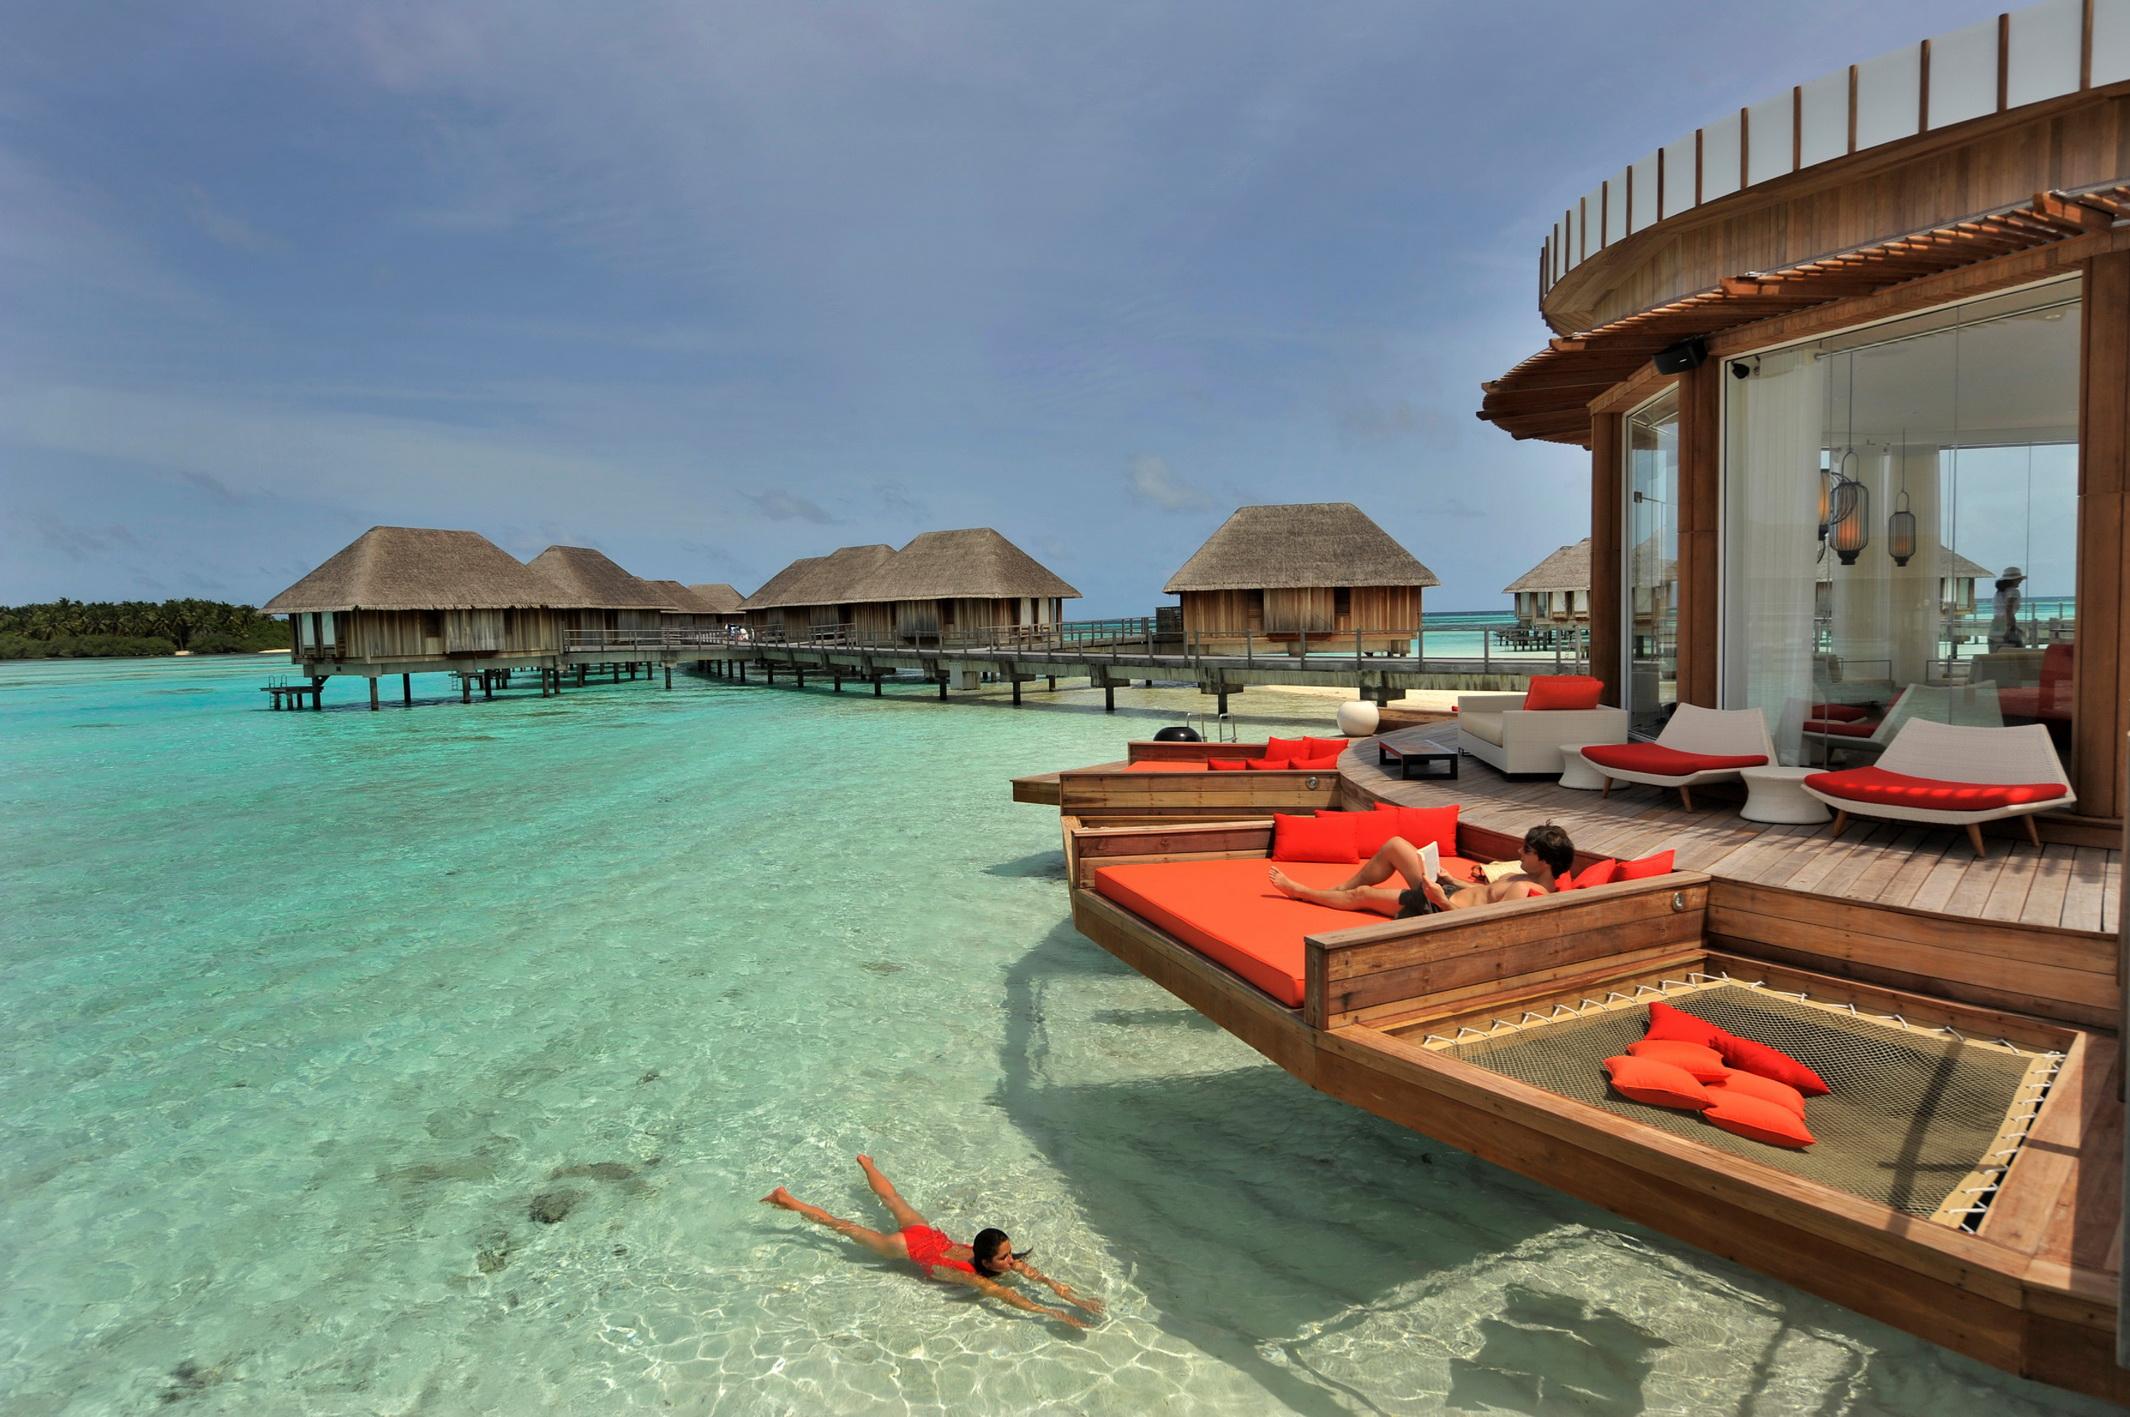 Club Med Kani, Maldives 3 วัน 2 คืน บินBangkok Airways